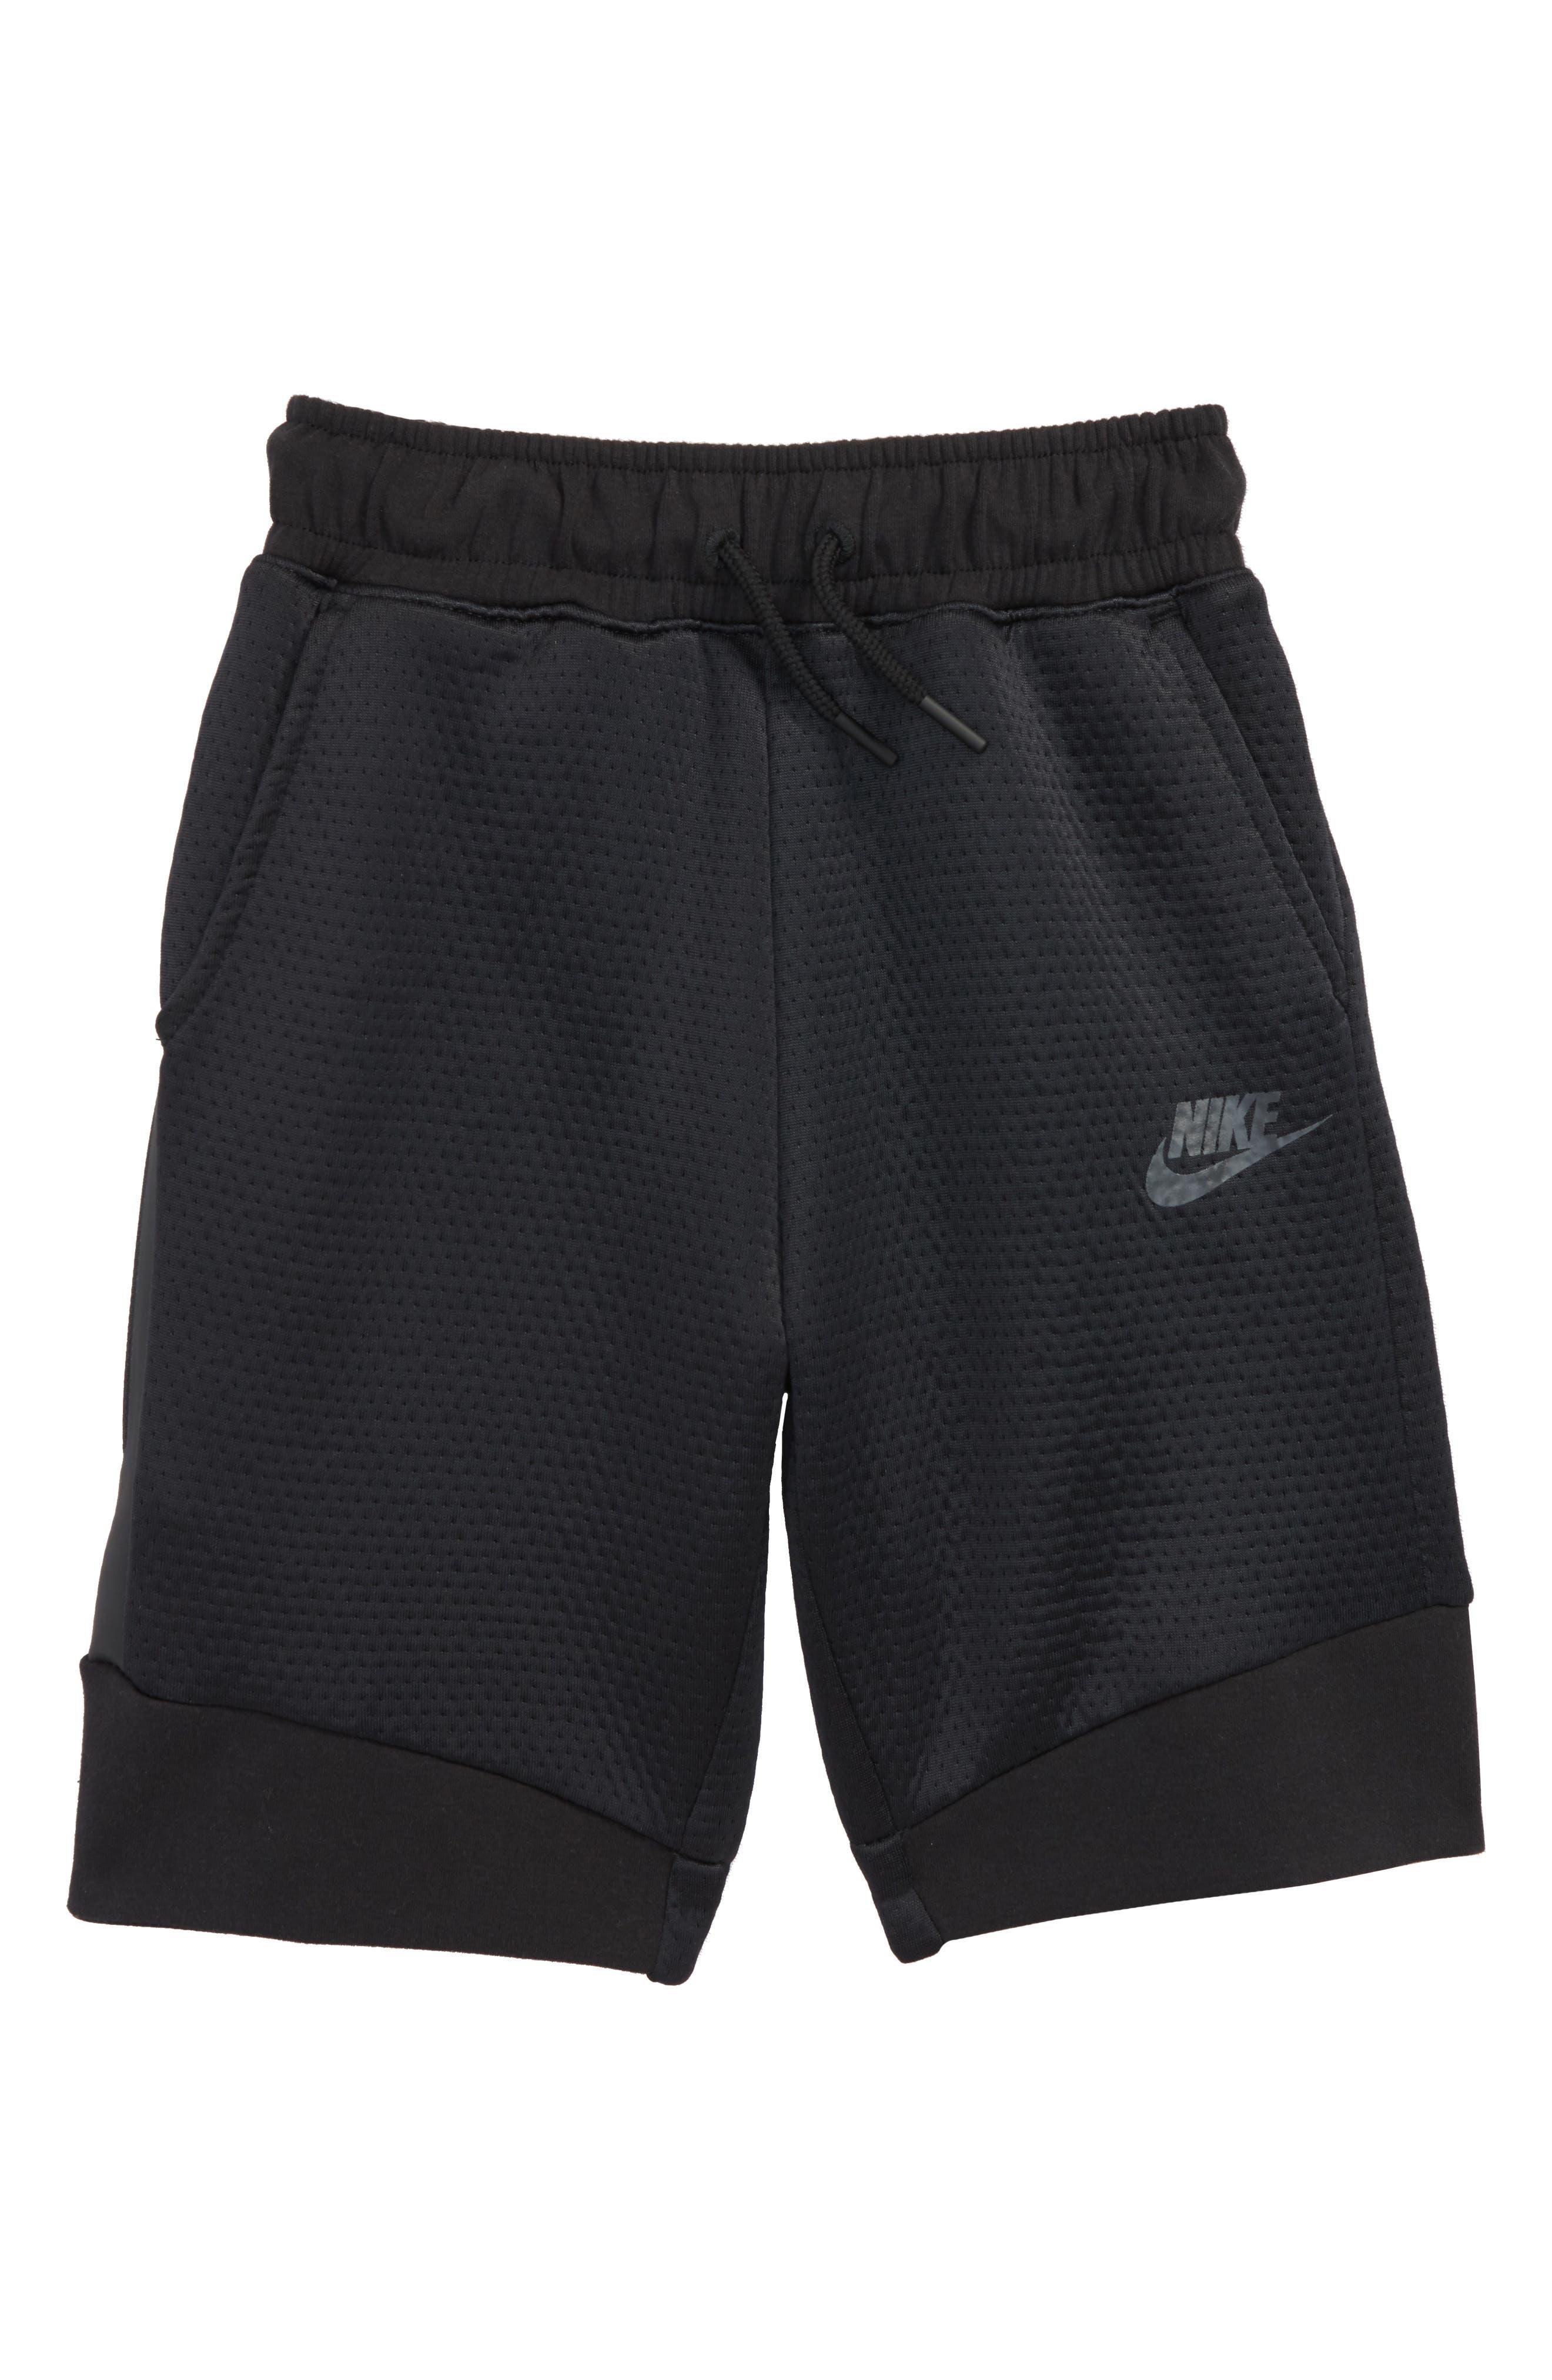 Tech Fleece Shorts,                             Main thumbnail 1, color,                             Black